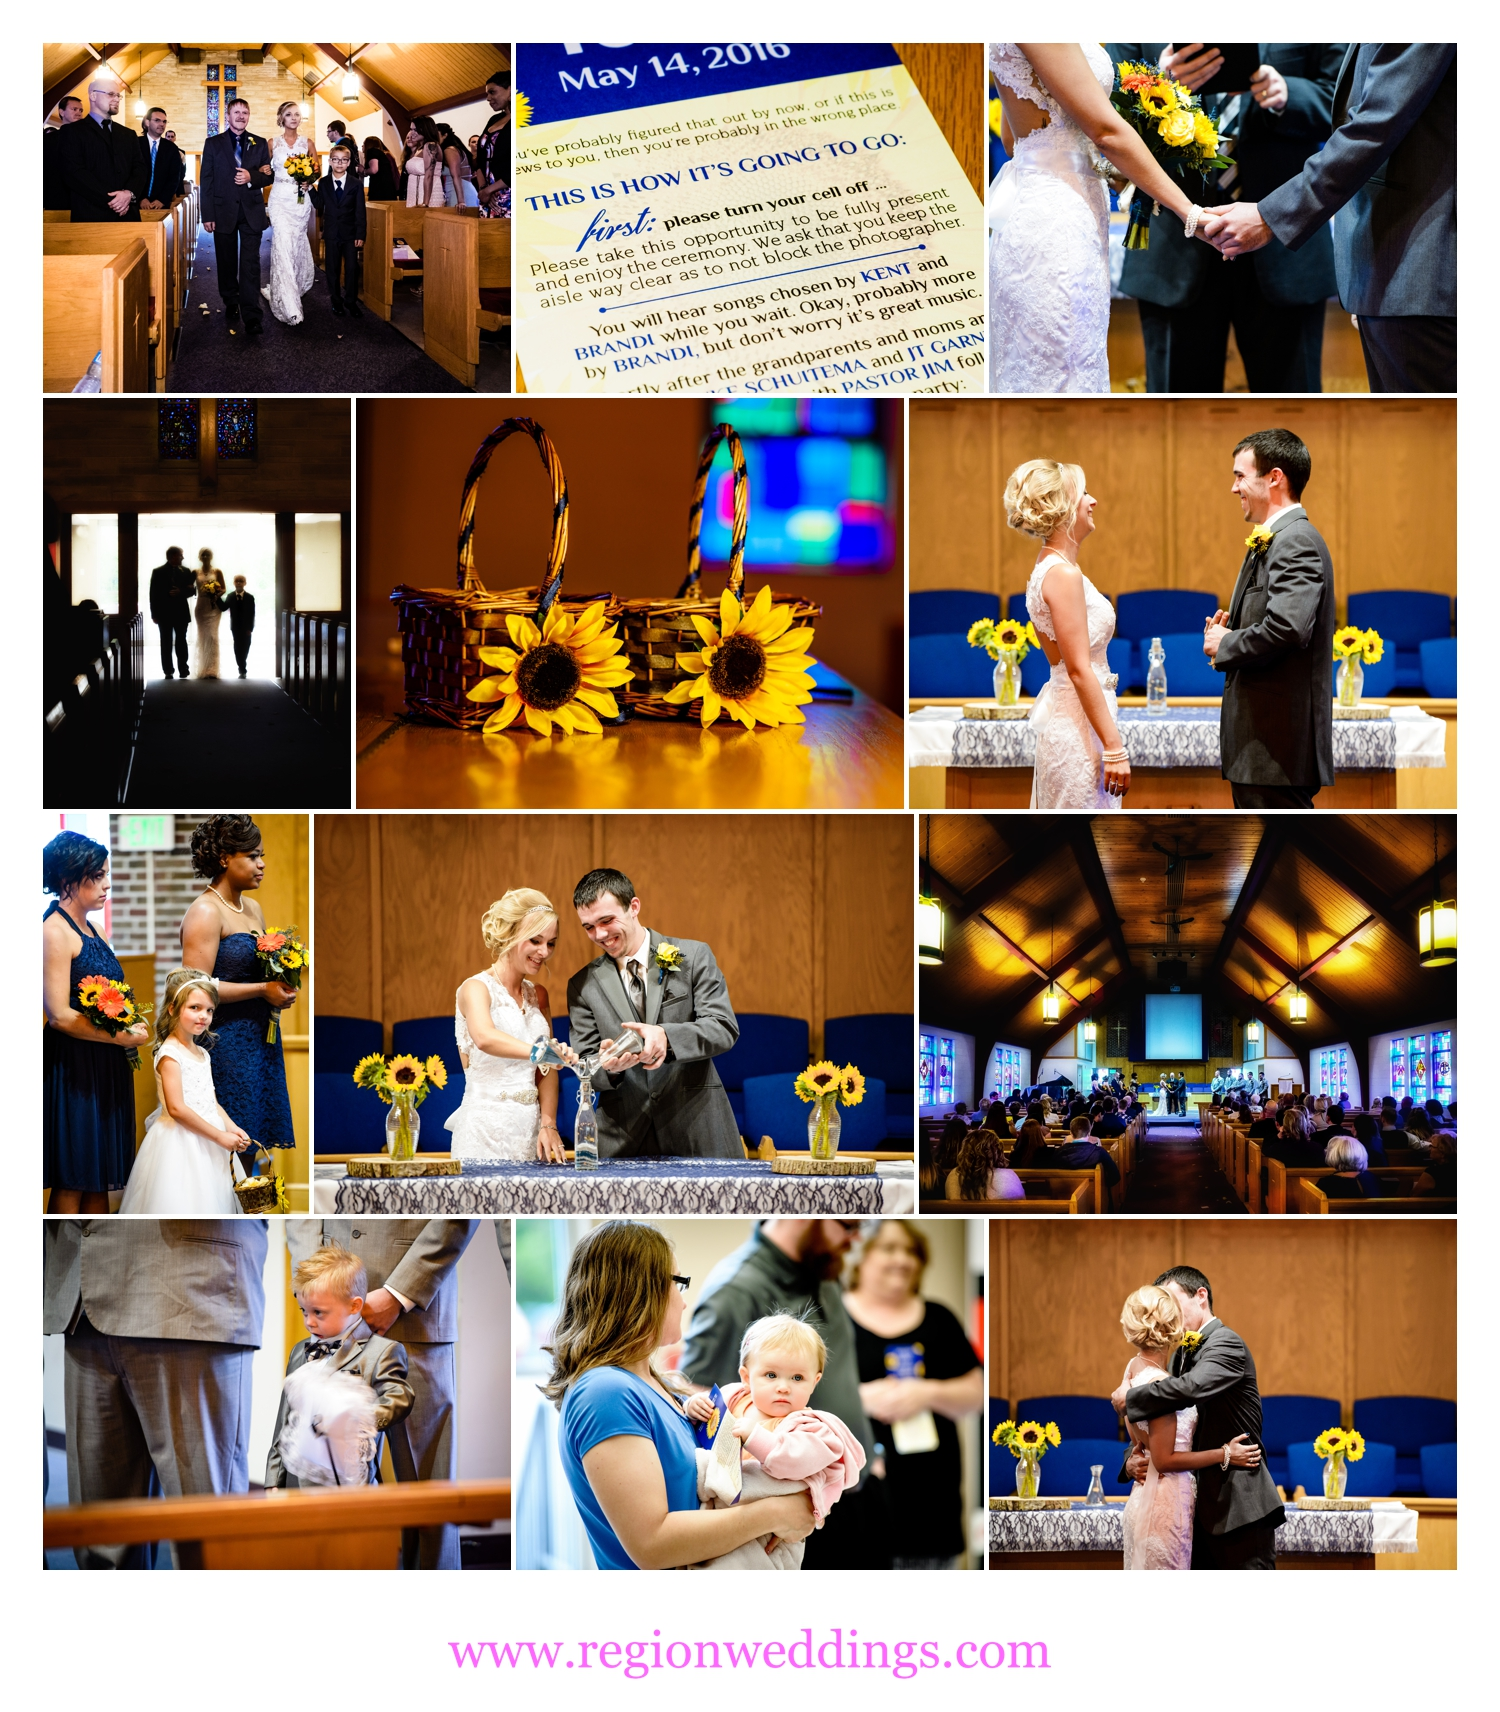 Wedding ceremony at Dyer United Methodist Church.